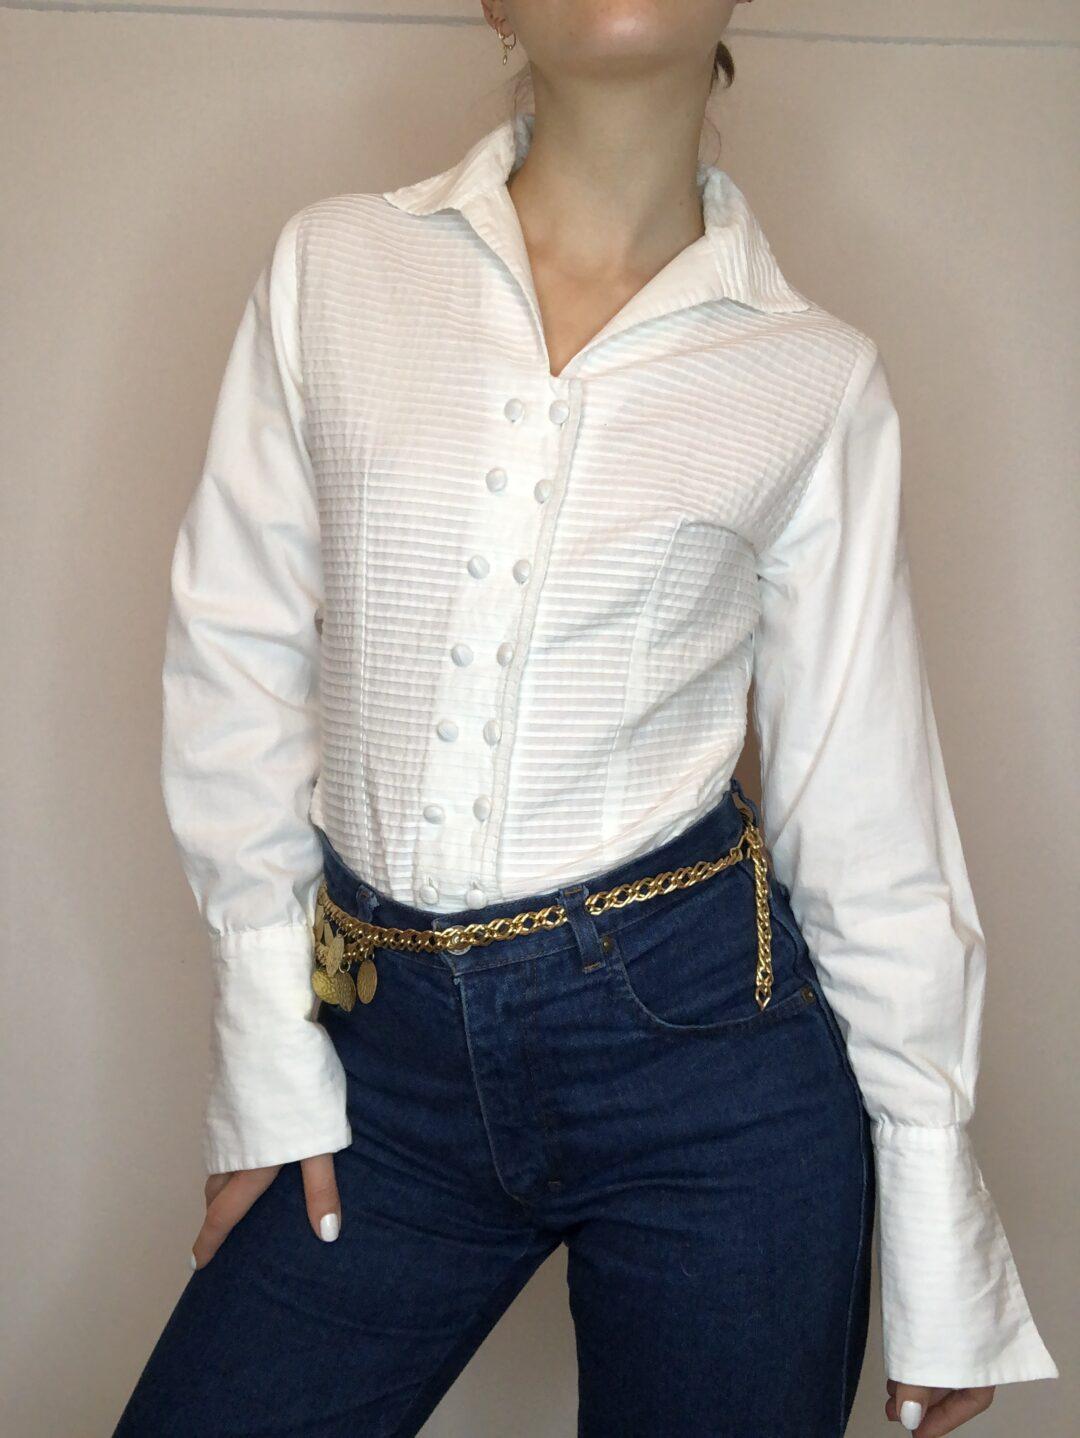 Vintage Collect23 shirt